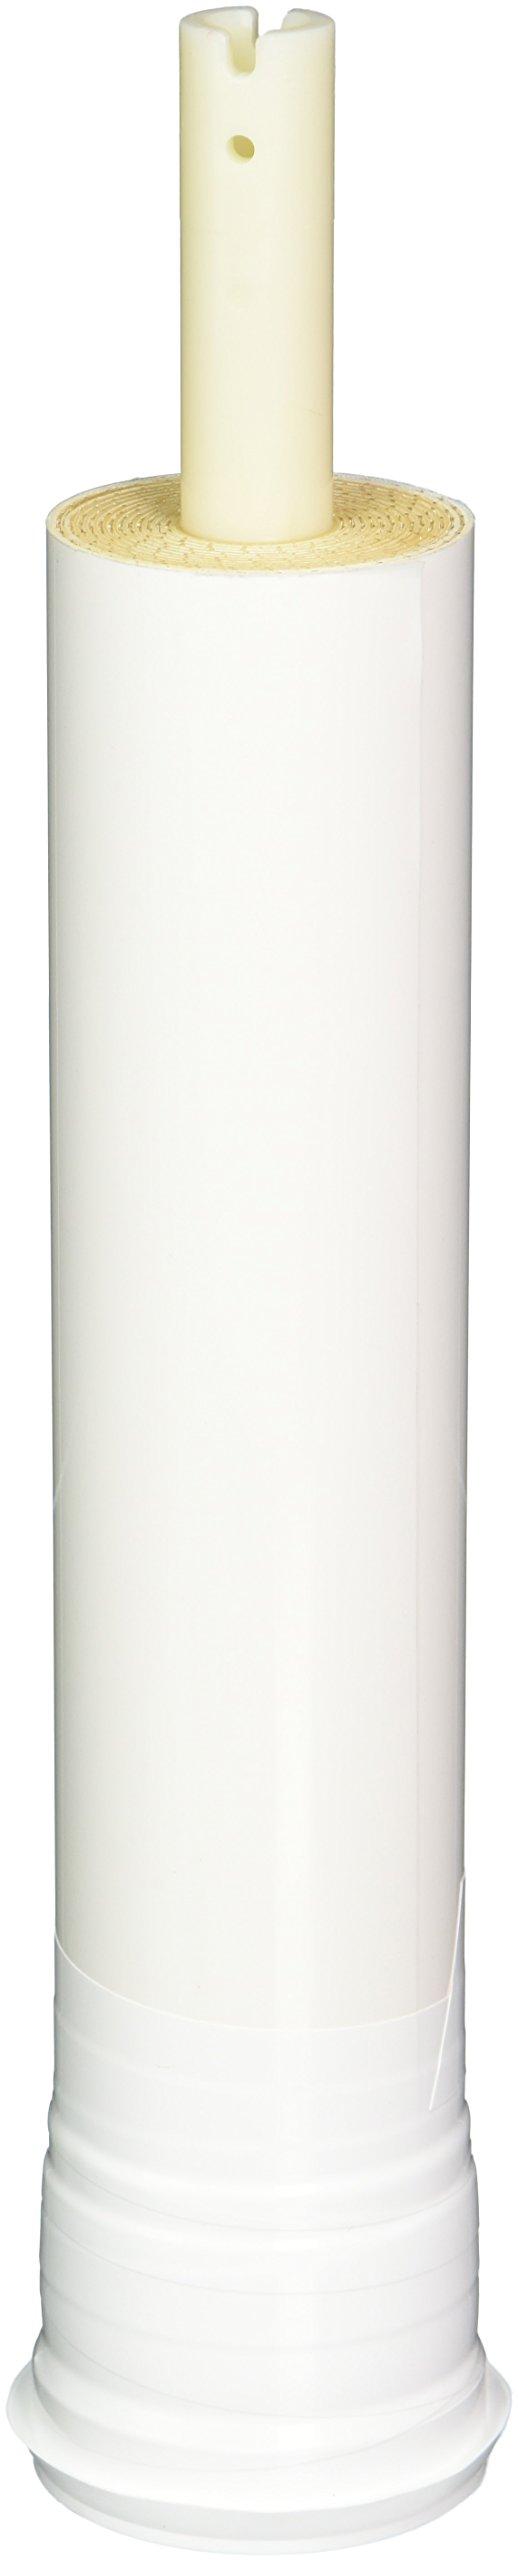 Microline Clack S-1229RS TFC-50 Reverse Osmosis Membrane